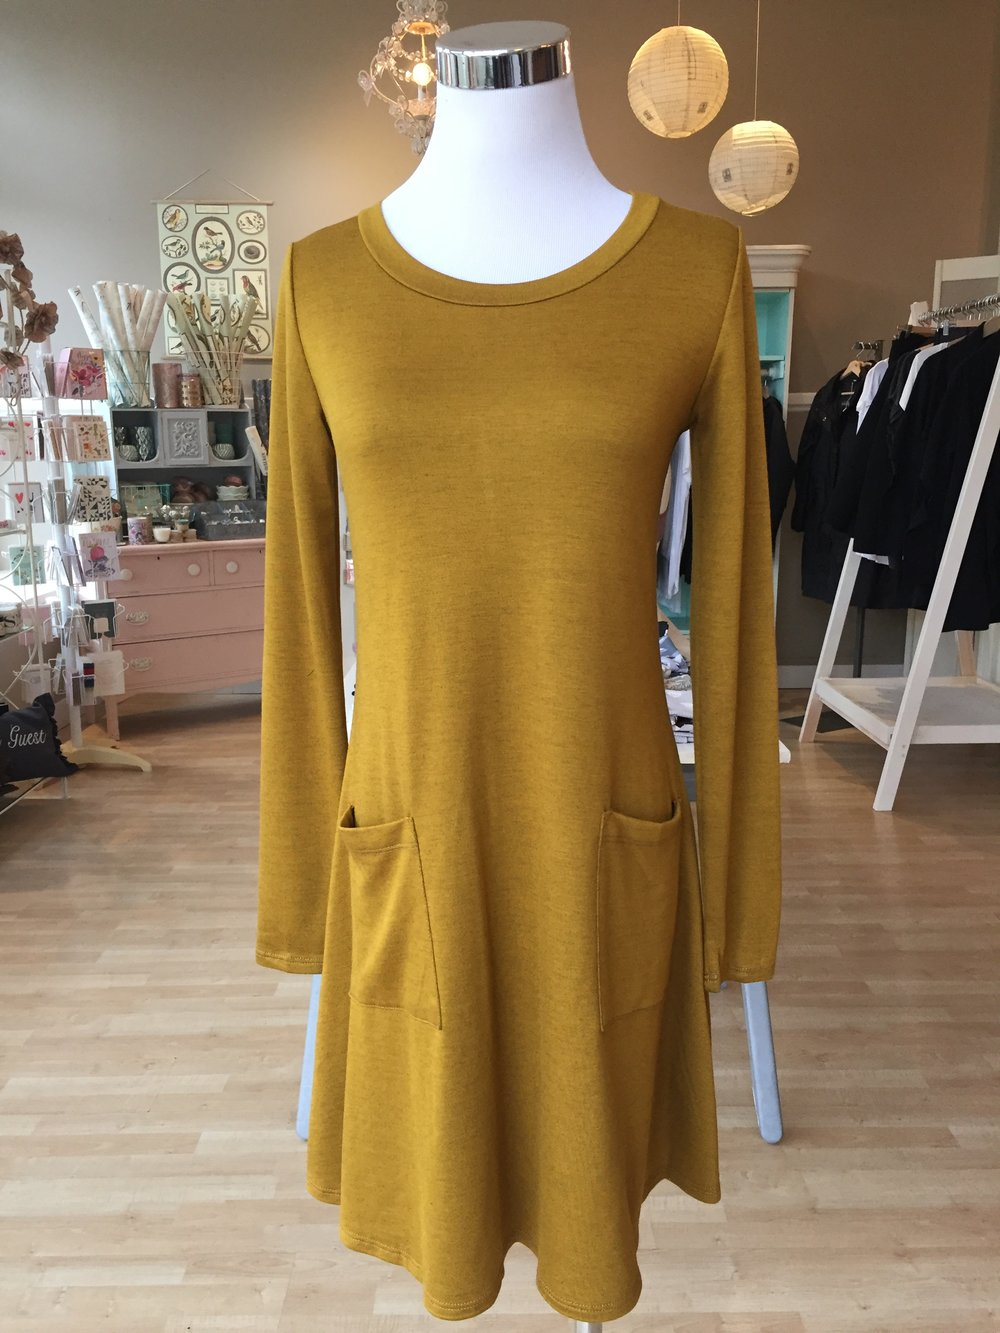 Gilli Mustard Dress $38